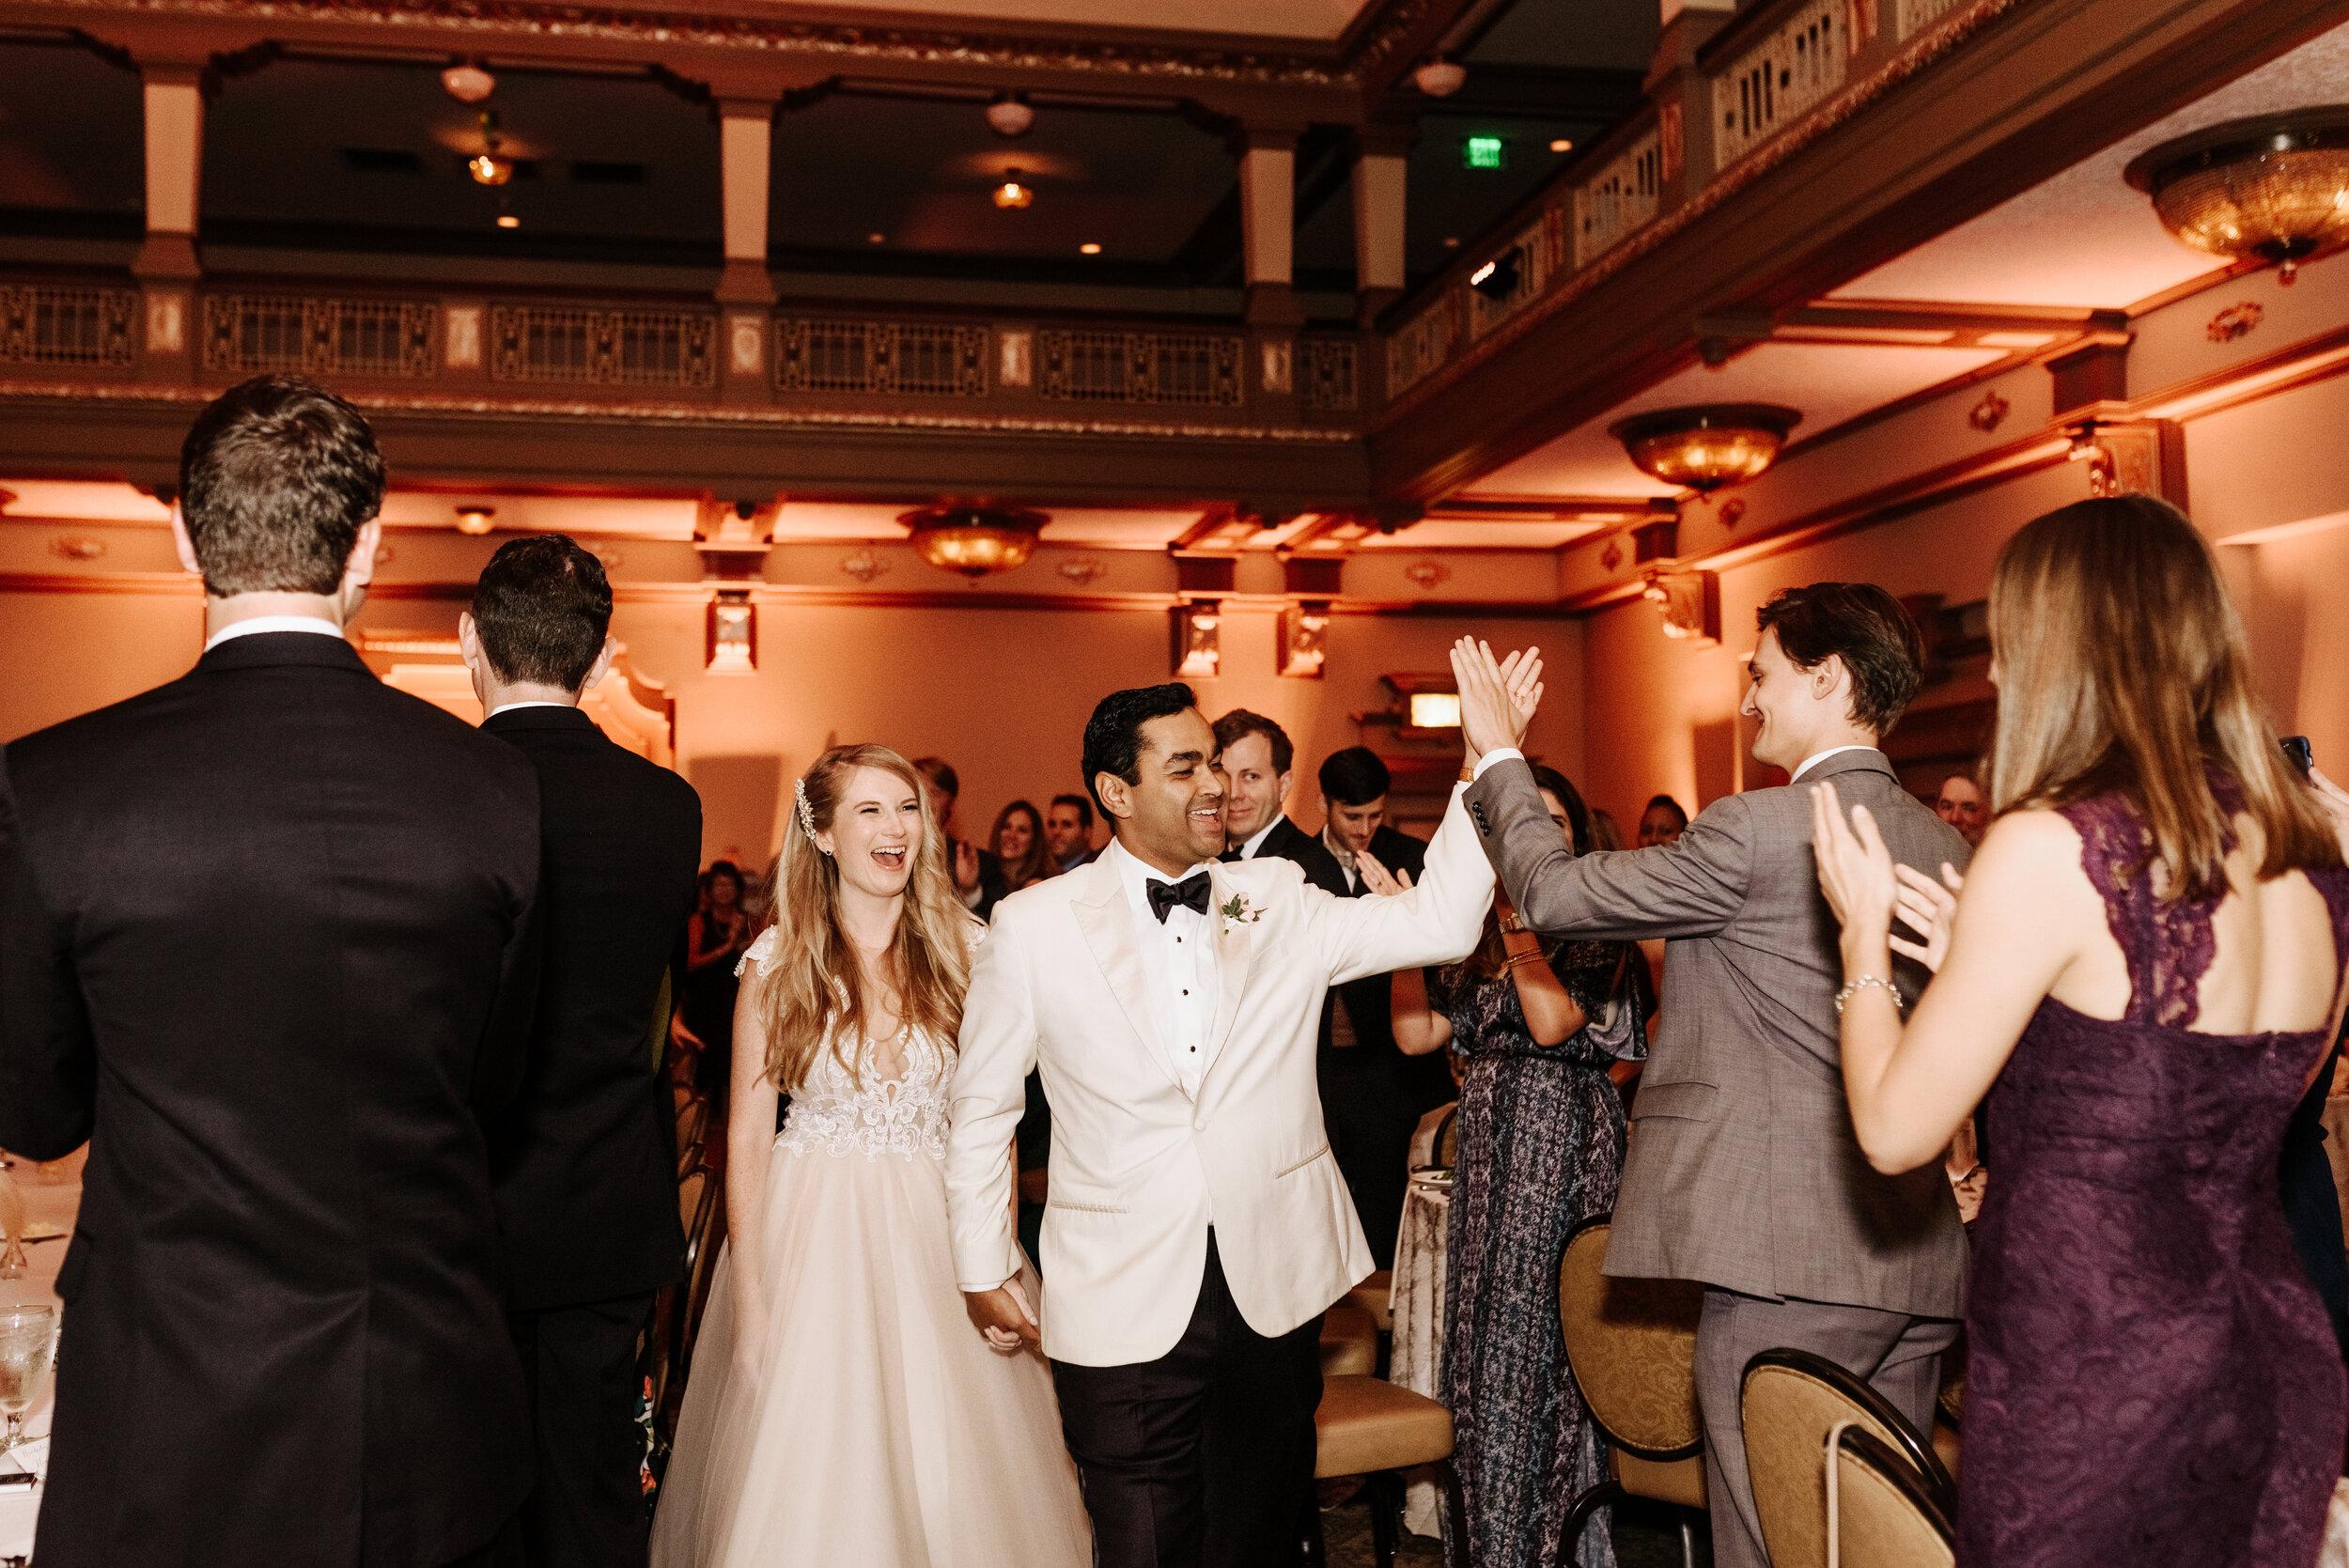 Cassie-Mrunal-Wedding-Quirk-Hotel-John-Marshall-Ballrooms-Richmond-Virginia-Photography-by-V-90.jpg